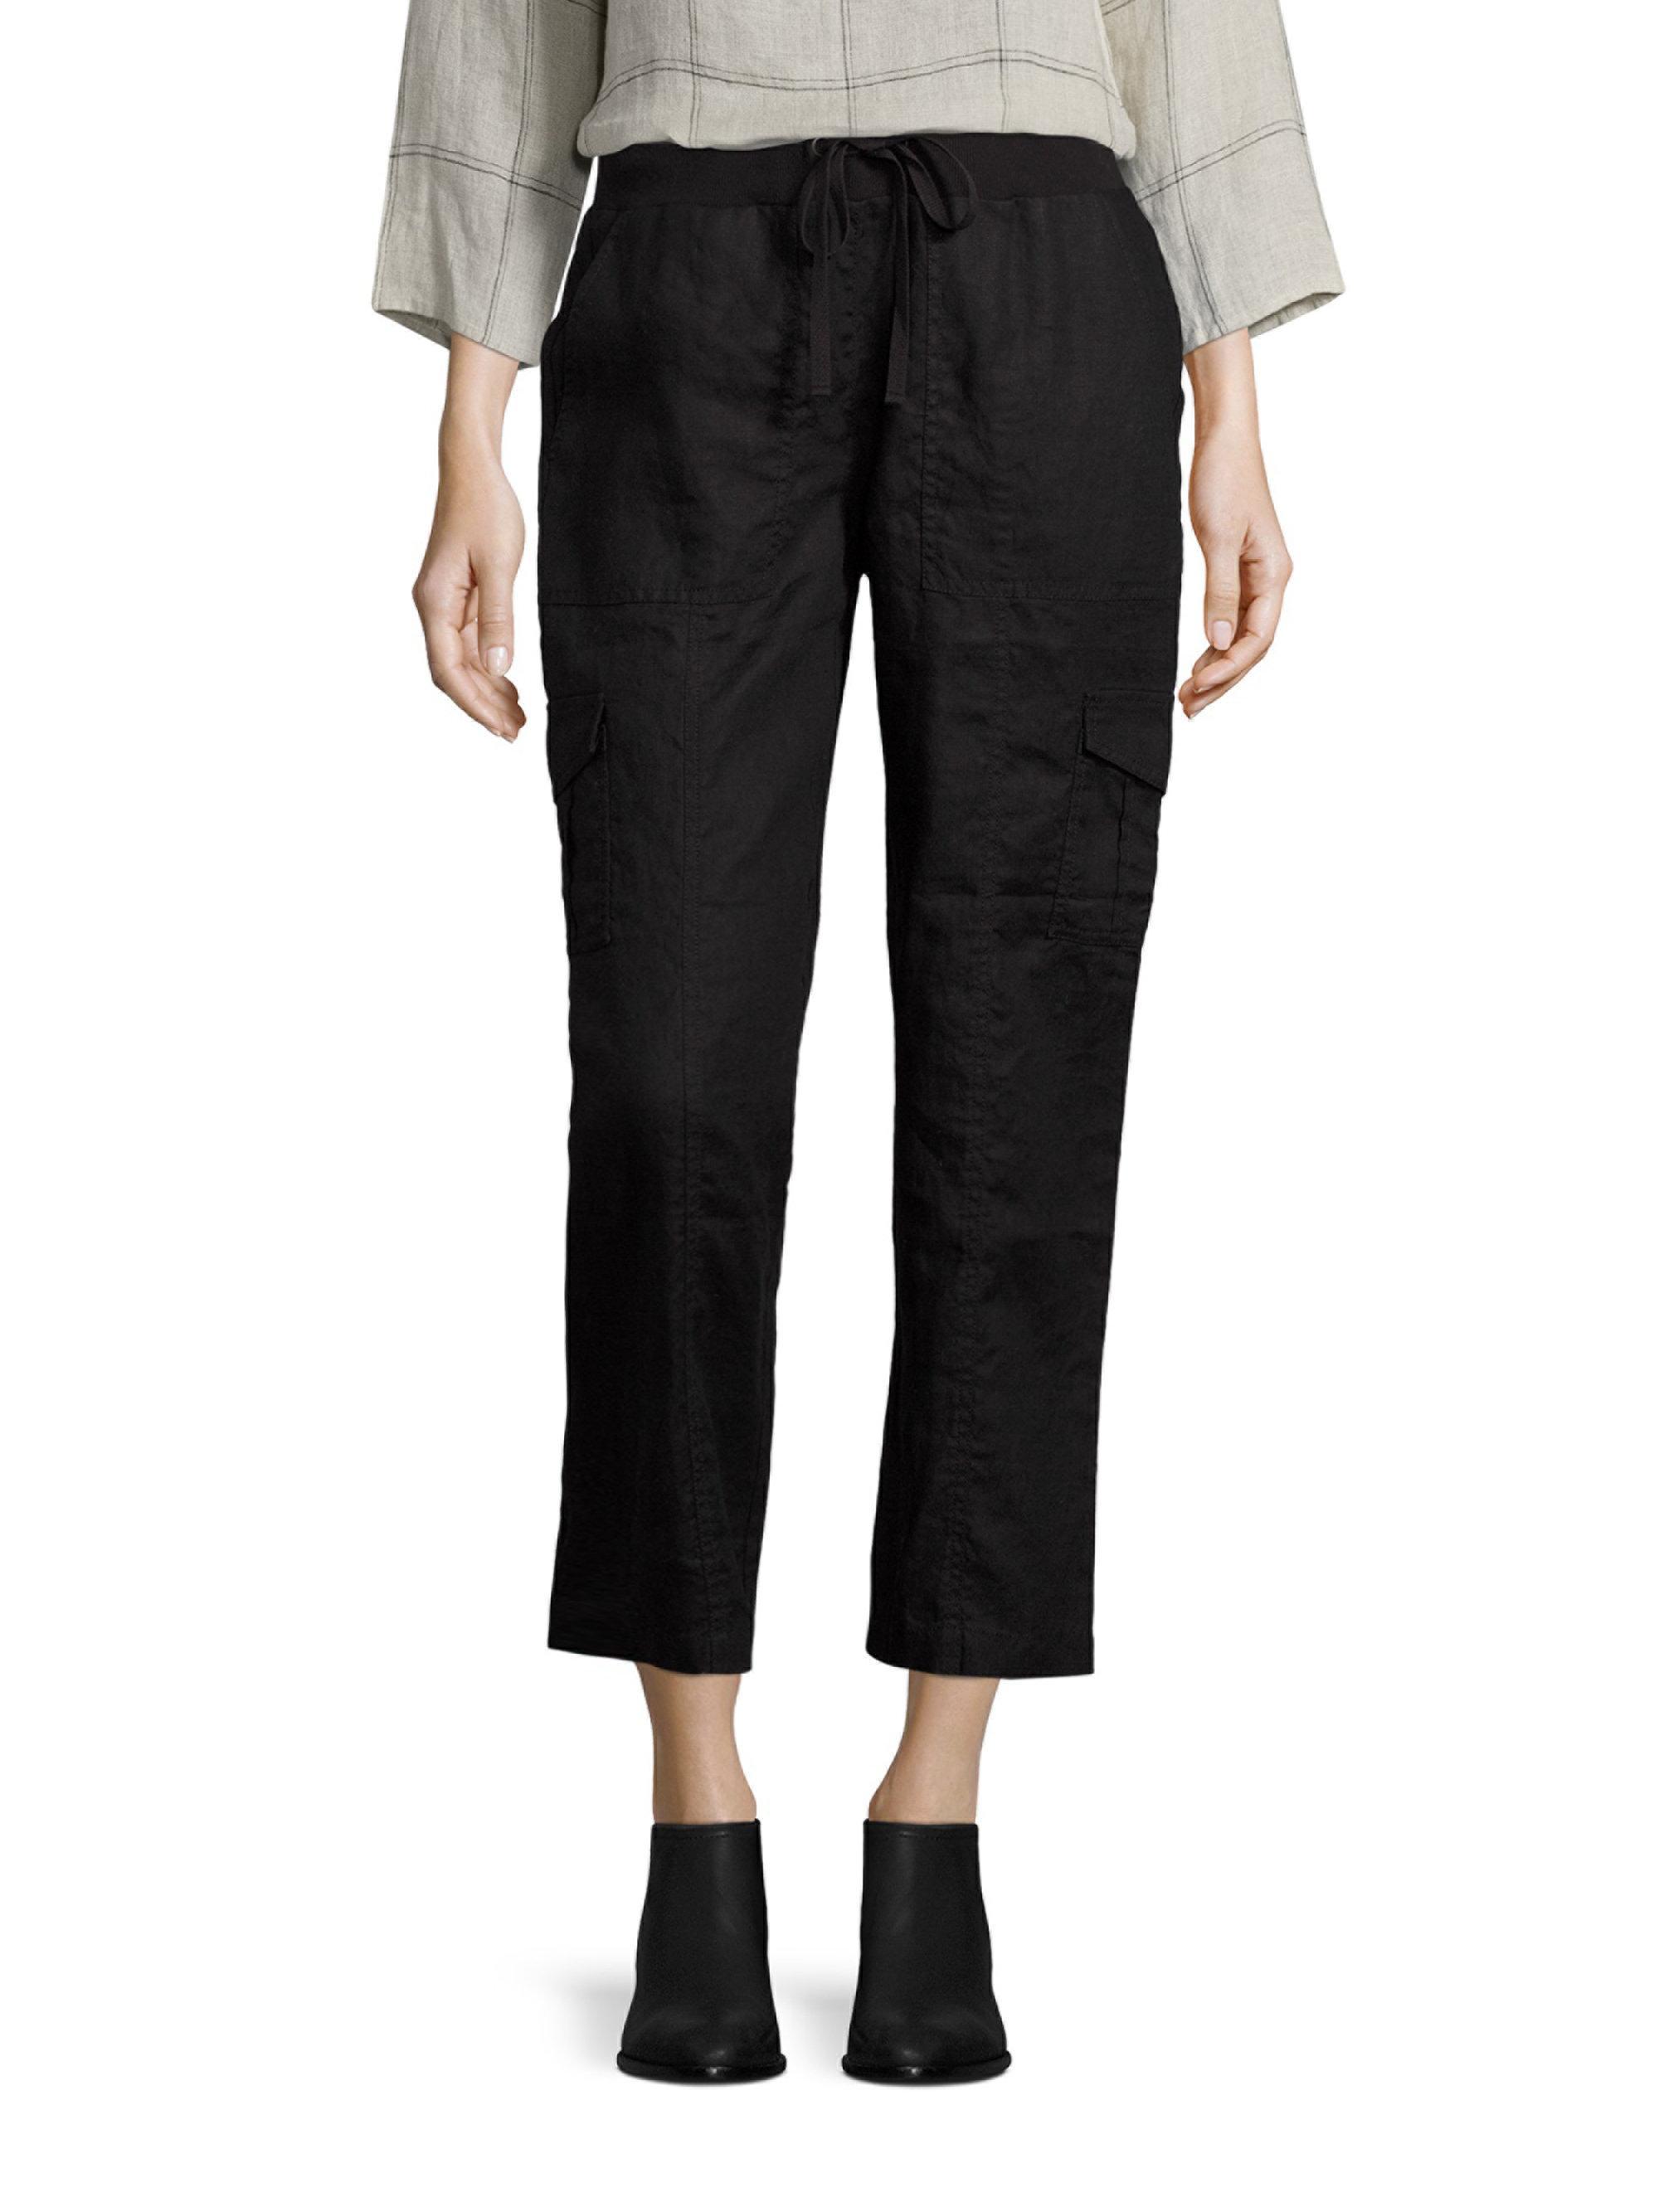 Lastest  From Esprit Esprit Cargo Pants Cargo Pants On Sale All Cargo Pants